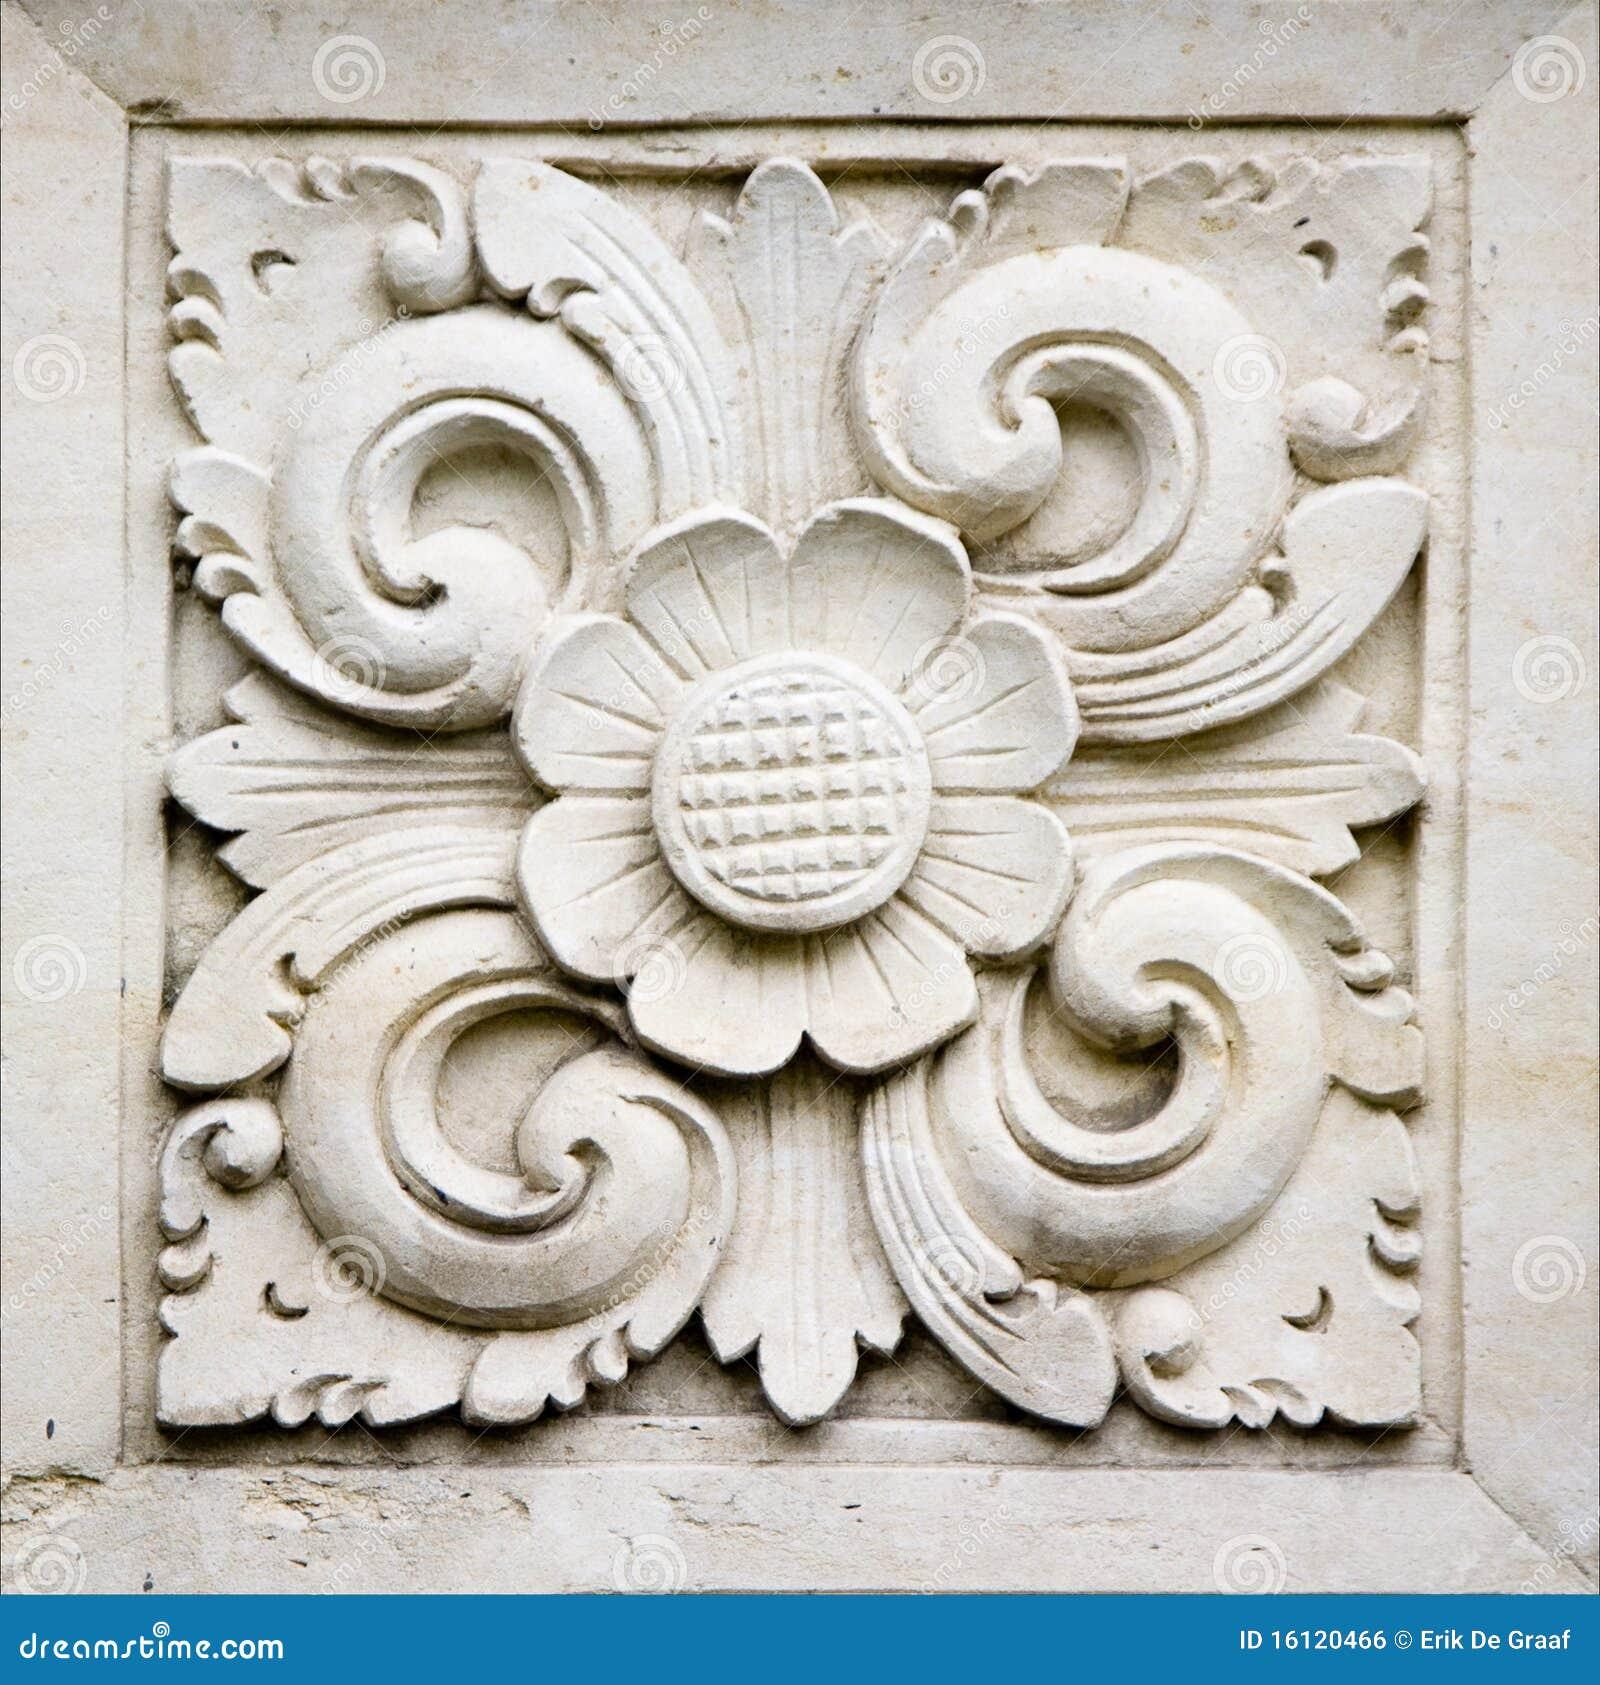 Bali stone carving royalty free stock image